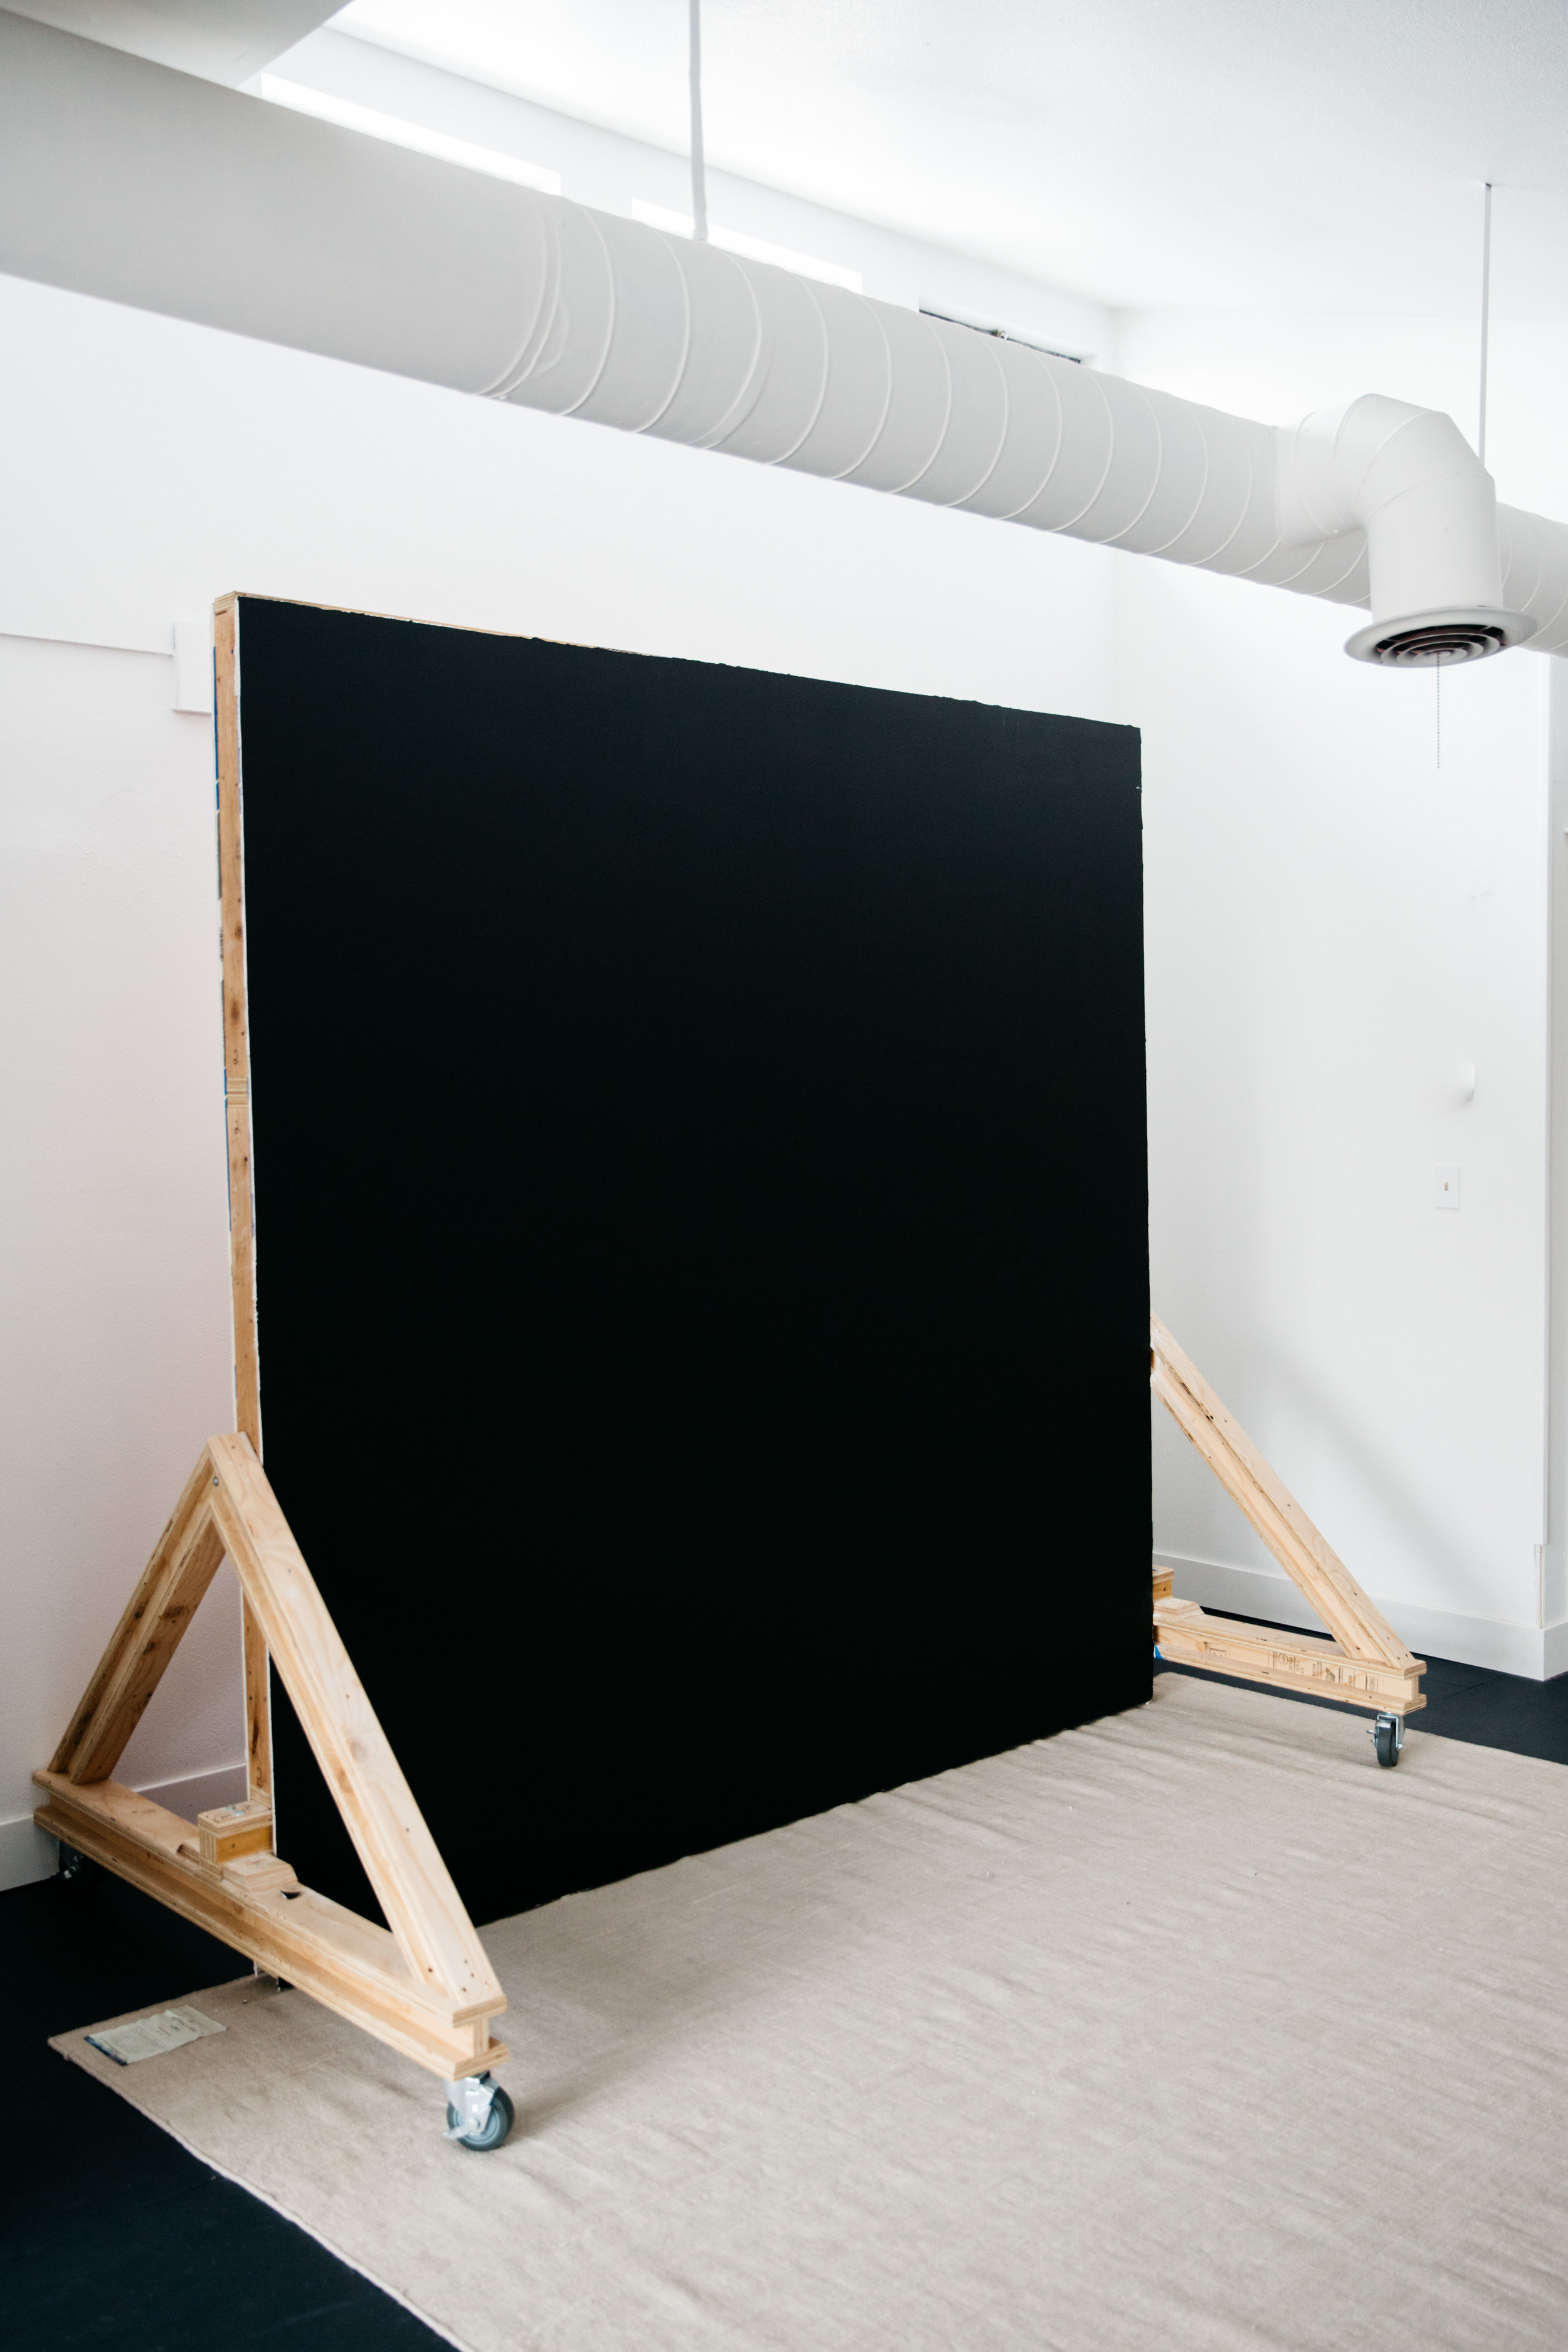 colorado-springs-photography-rental-studio-45.jpg